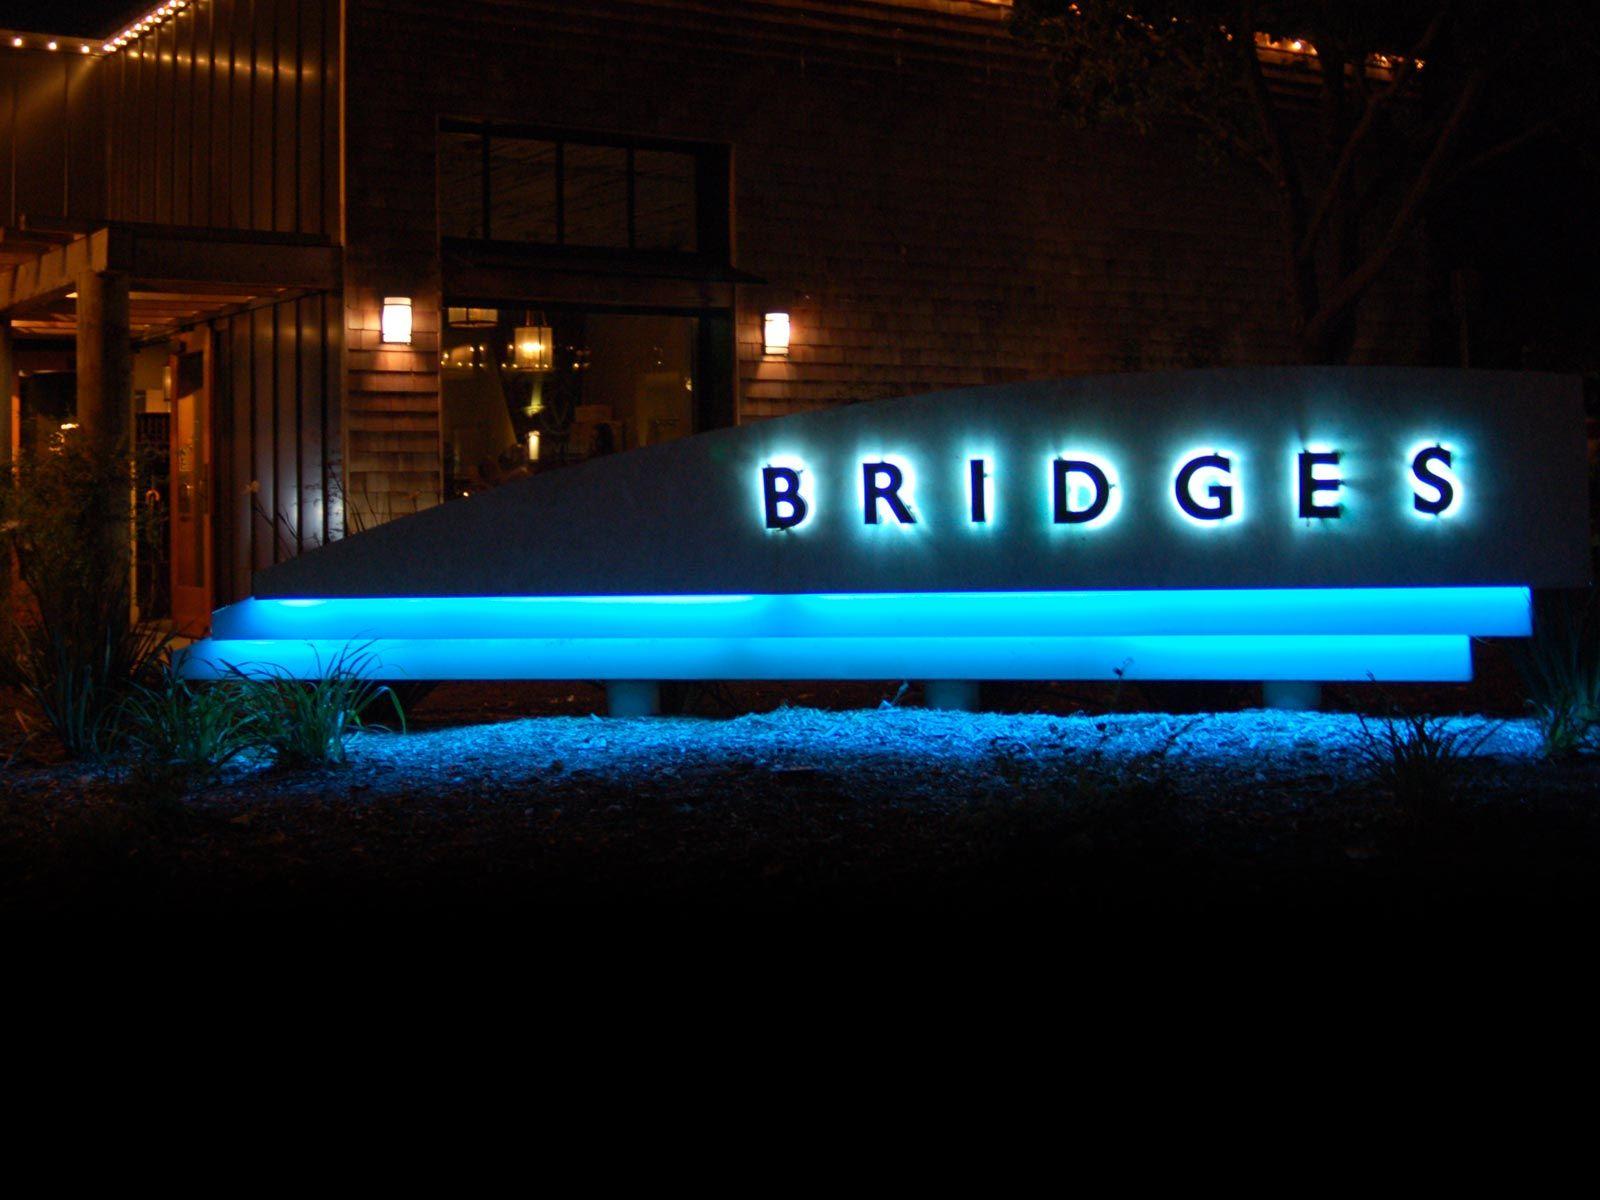 The Bridges in Danville CA